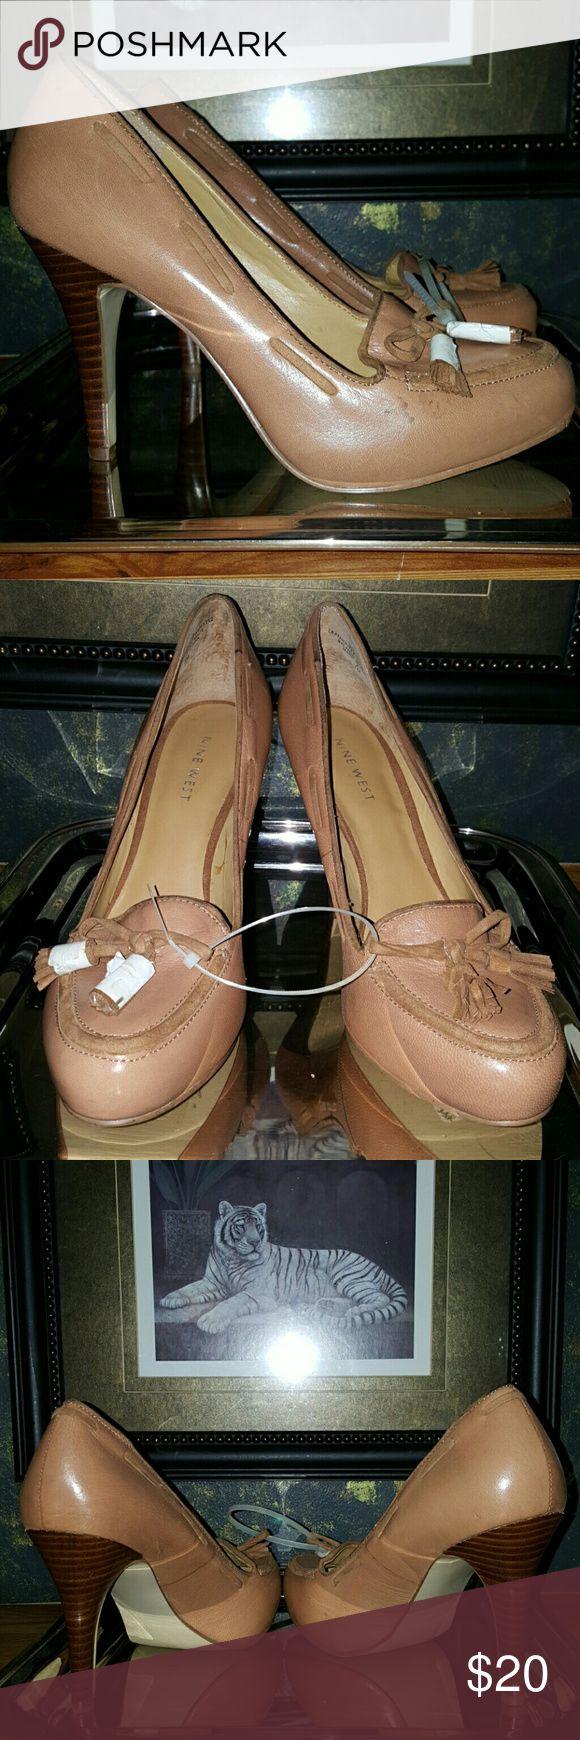 Beautiful Nine West heels SZ US 7.5M leather heels never worn NINE WEST. Nine West Shoes Platforms